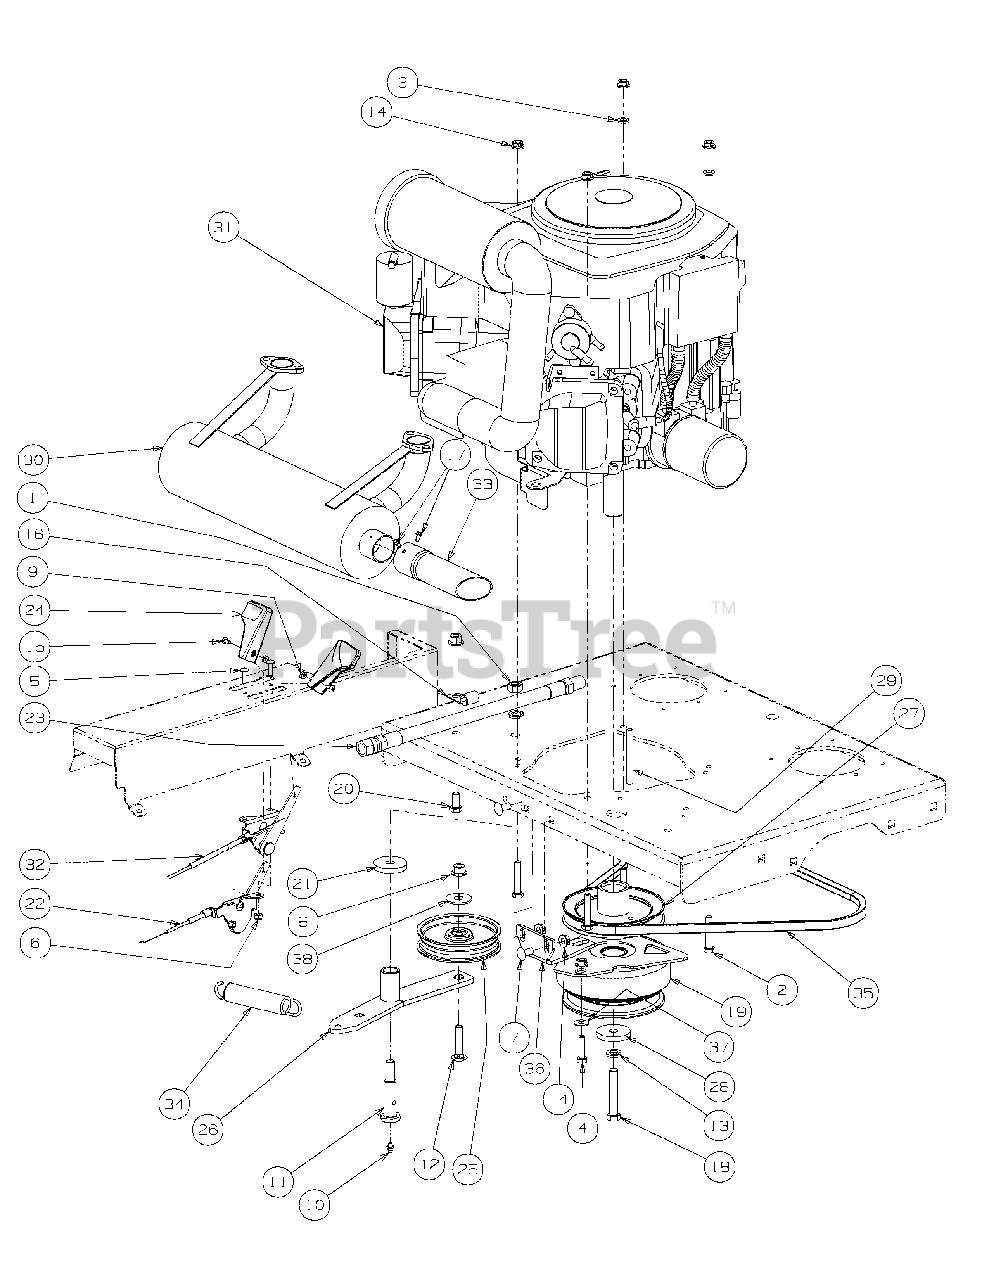 Cub Cadet Parts On The Engine Assembly Kohler Diagram For M60-kh  53cb5bdx750